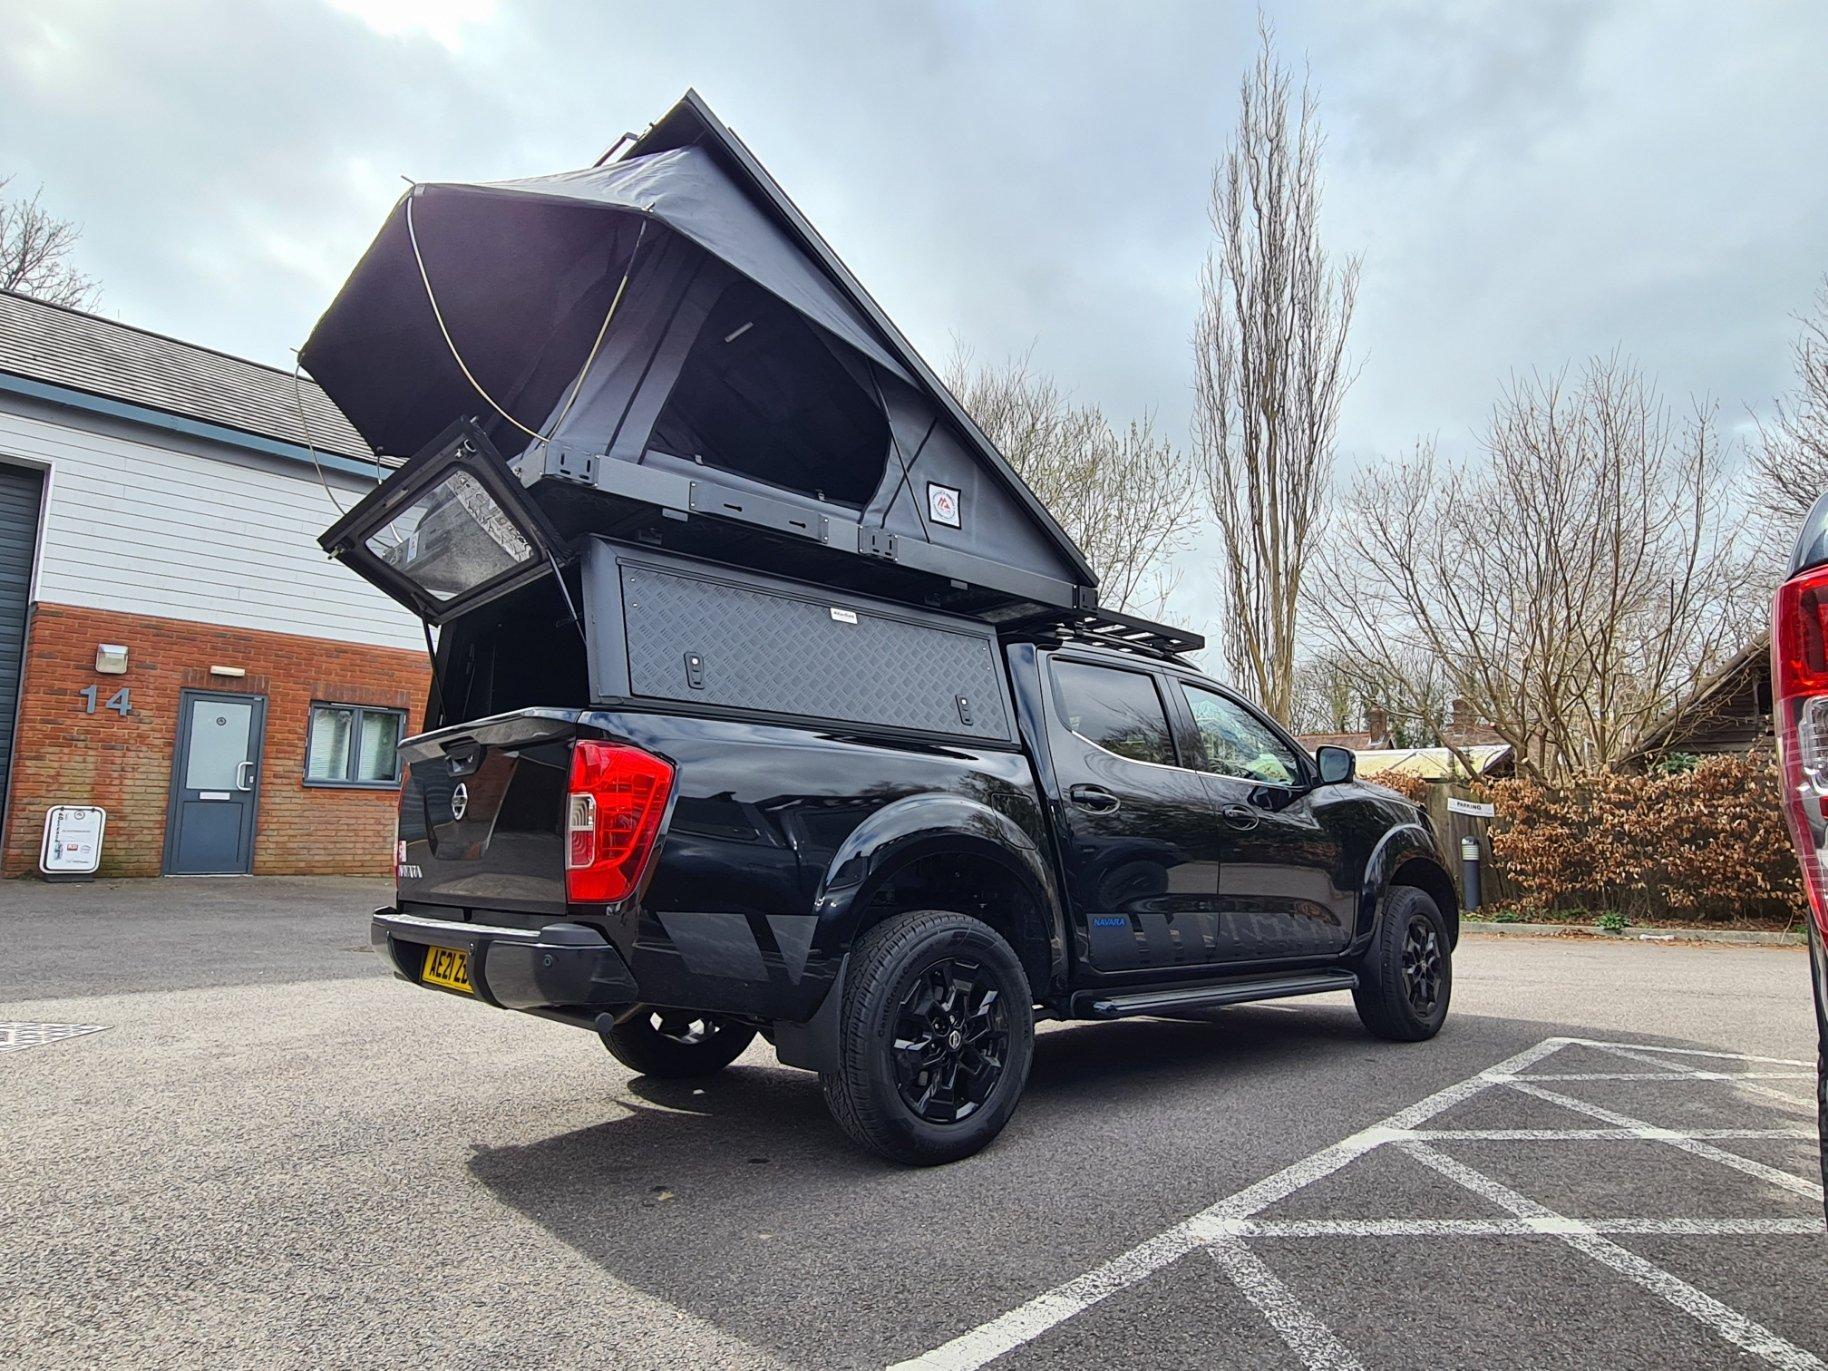 tuff-trek 4x4 overland series mk2 aluminium roof top tent